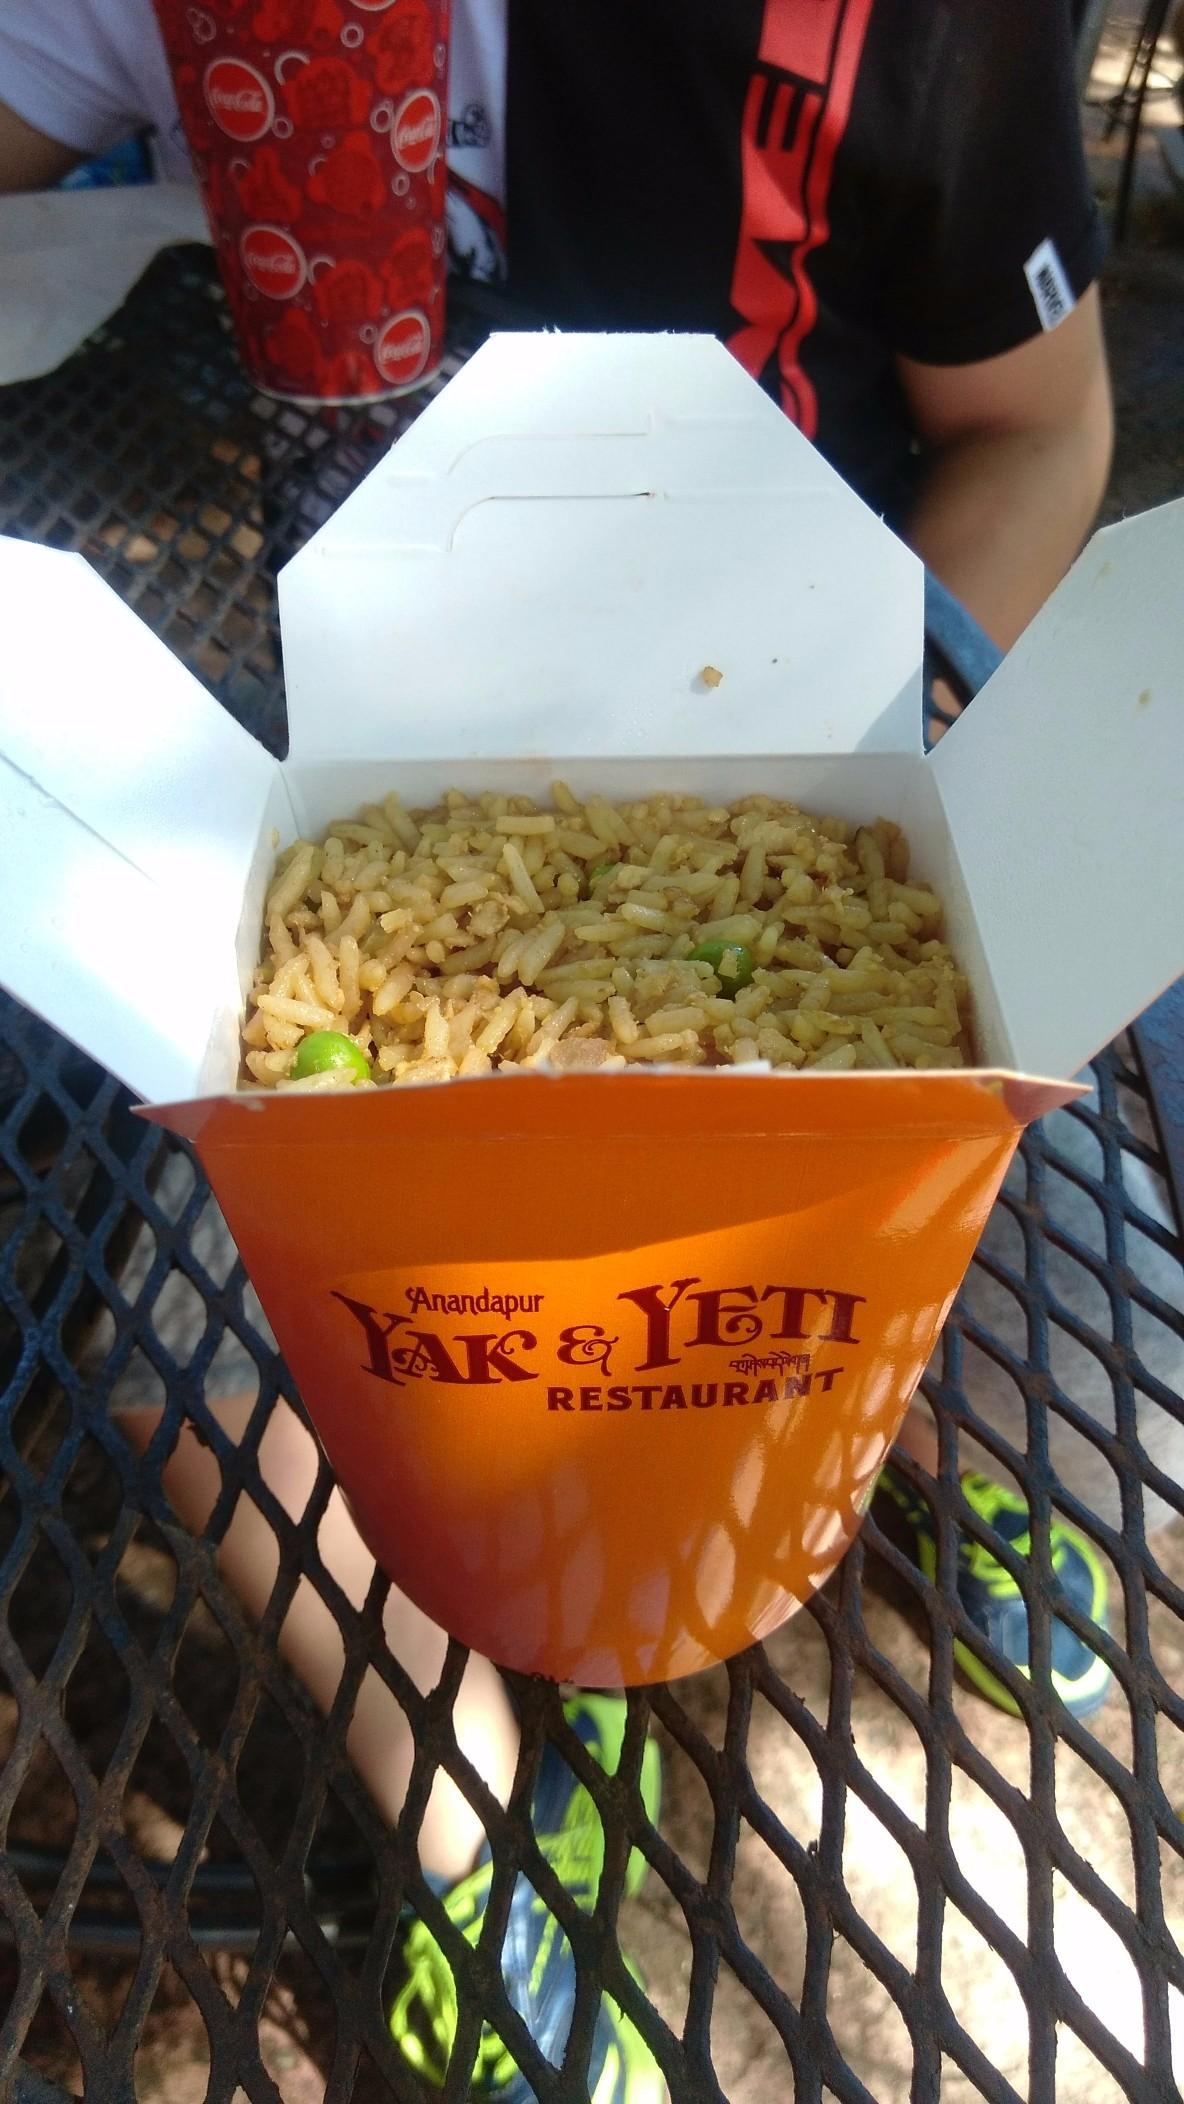 yak and yeti menu snack credits animal kingdom (1)